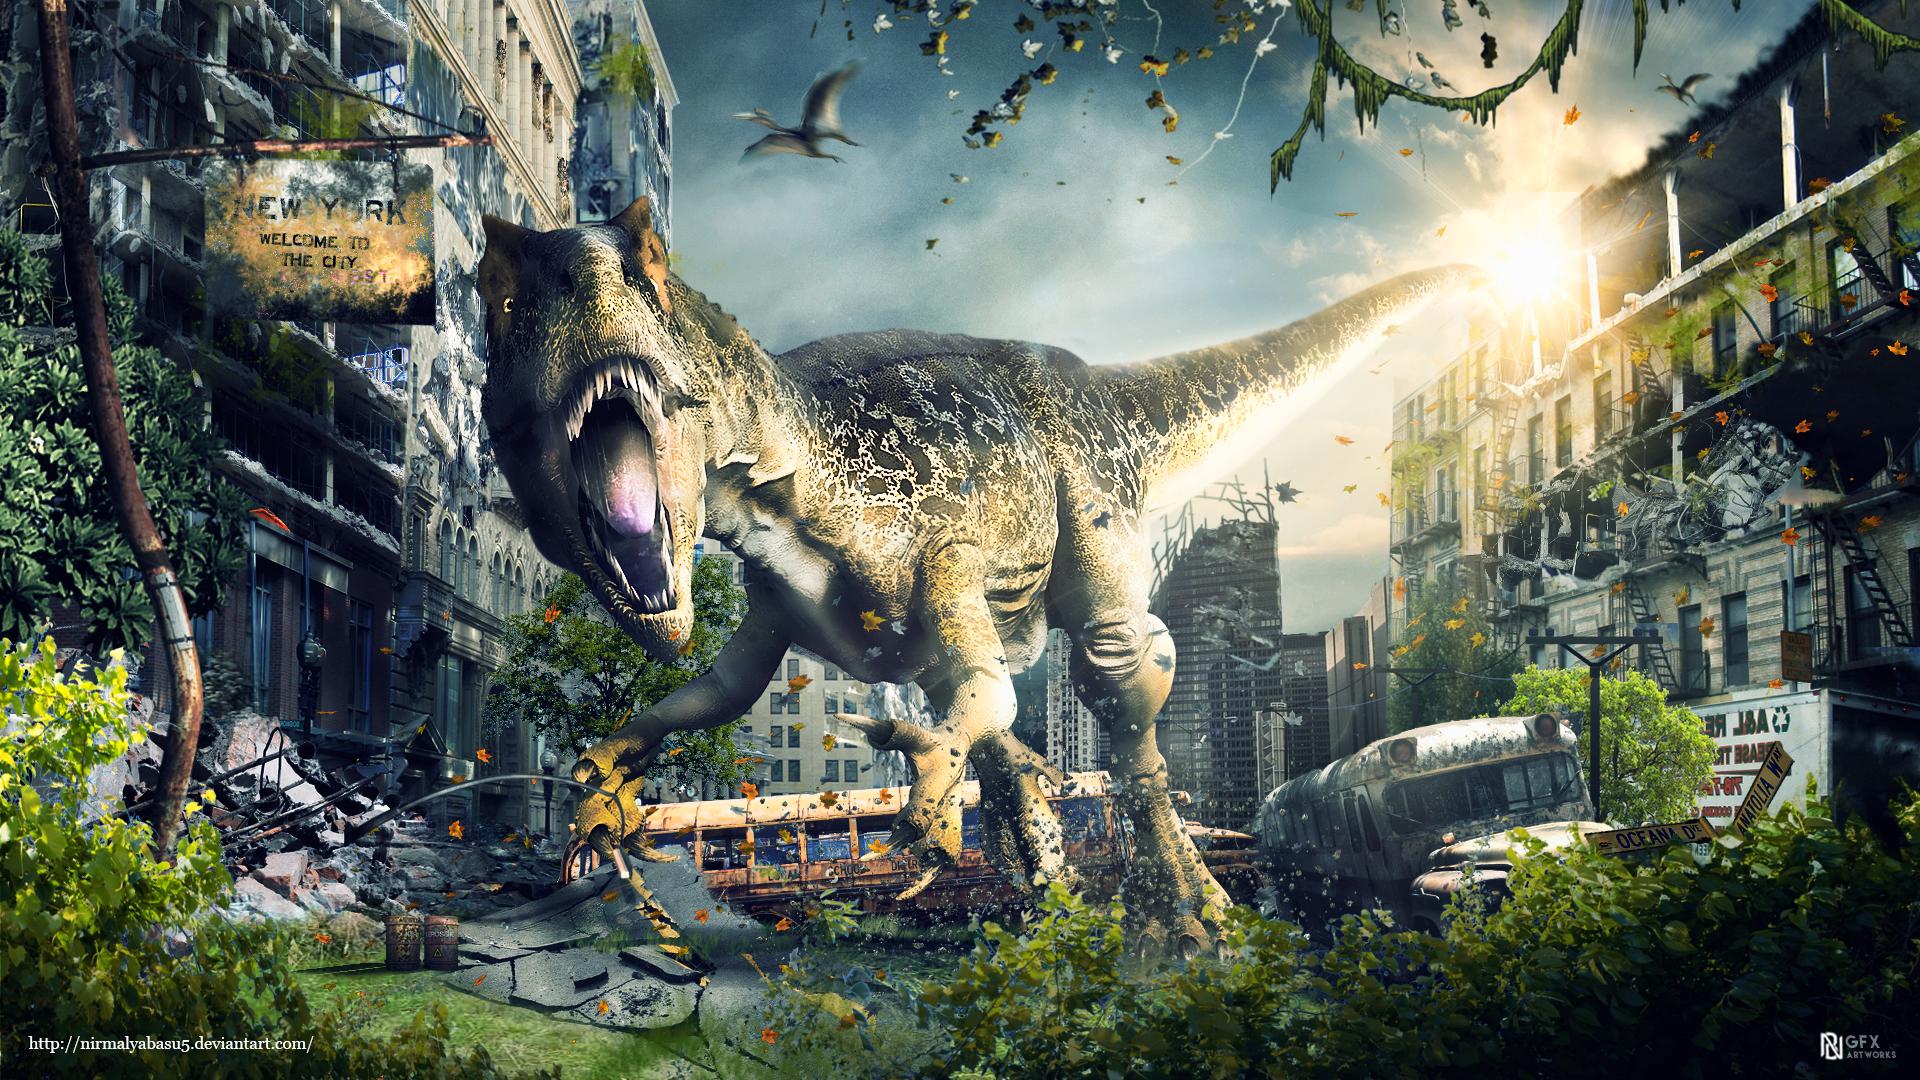 The return of dinosaurs